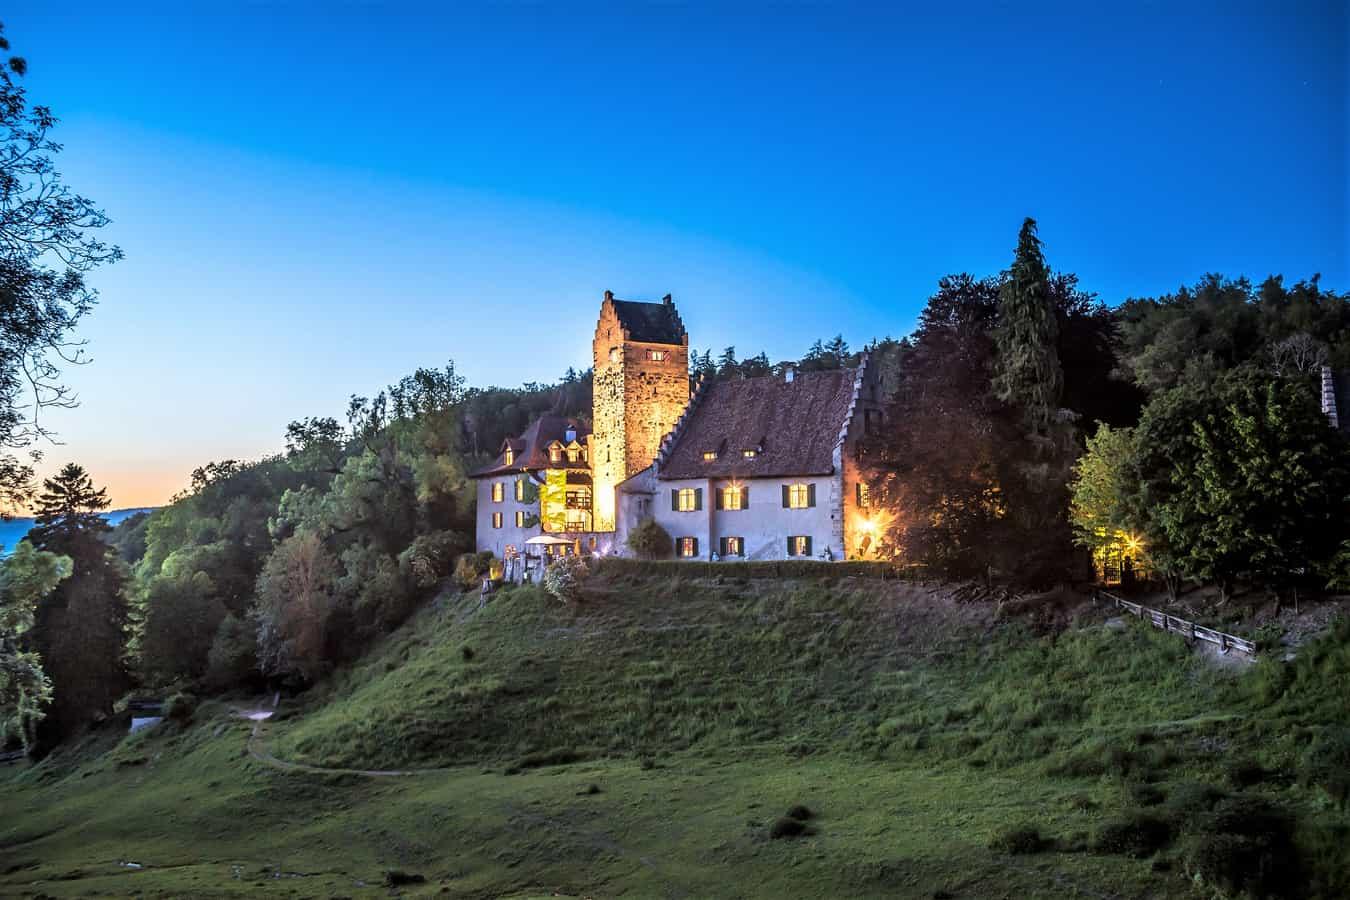 Burg Liebenfels in Lanzenneunforn